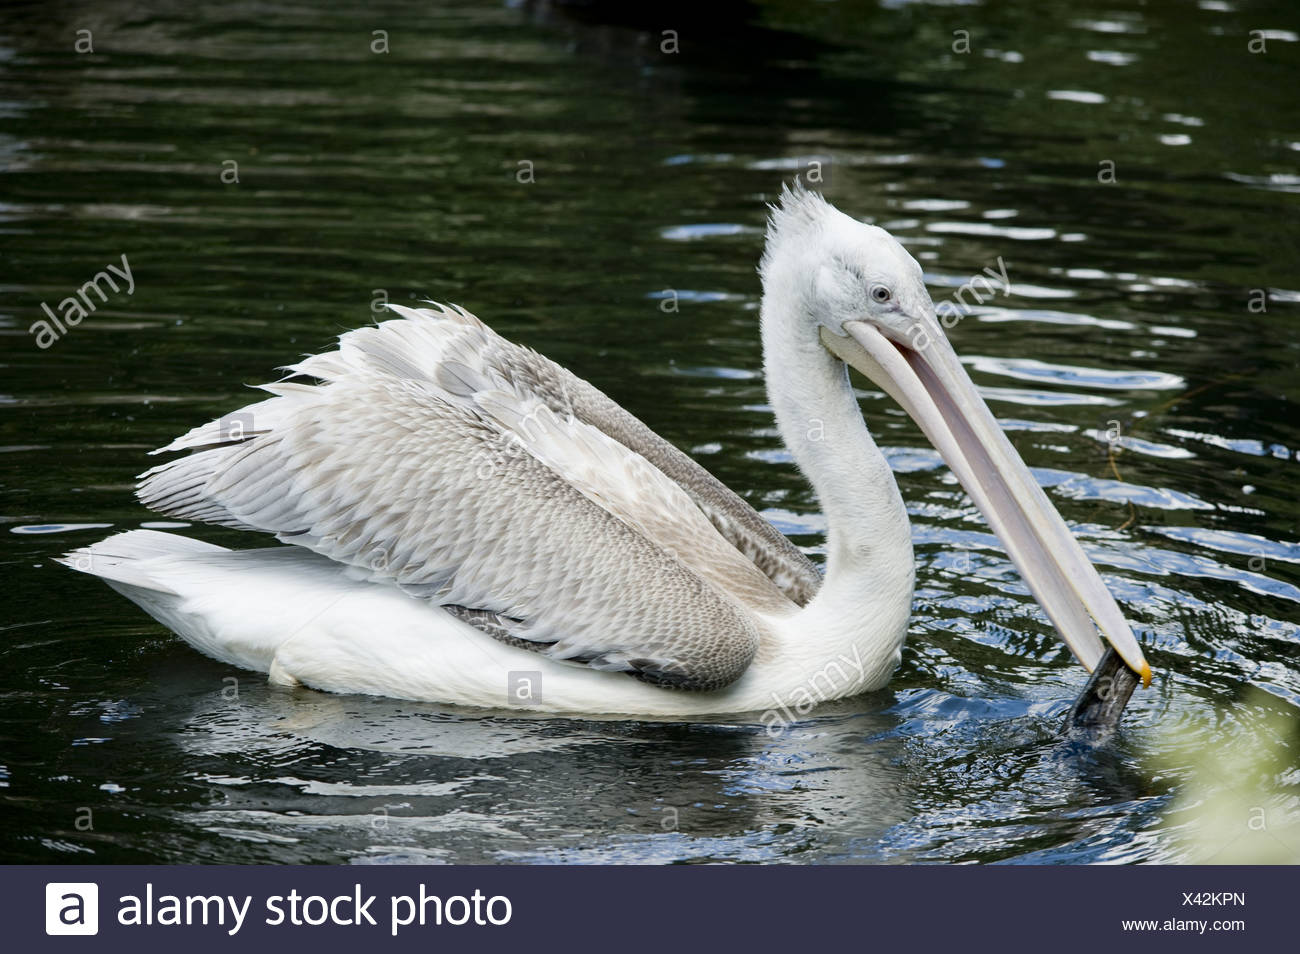 dalmatian pelican, pelecanus crispus - Stock Image